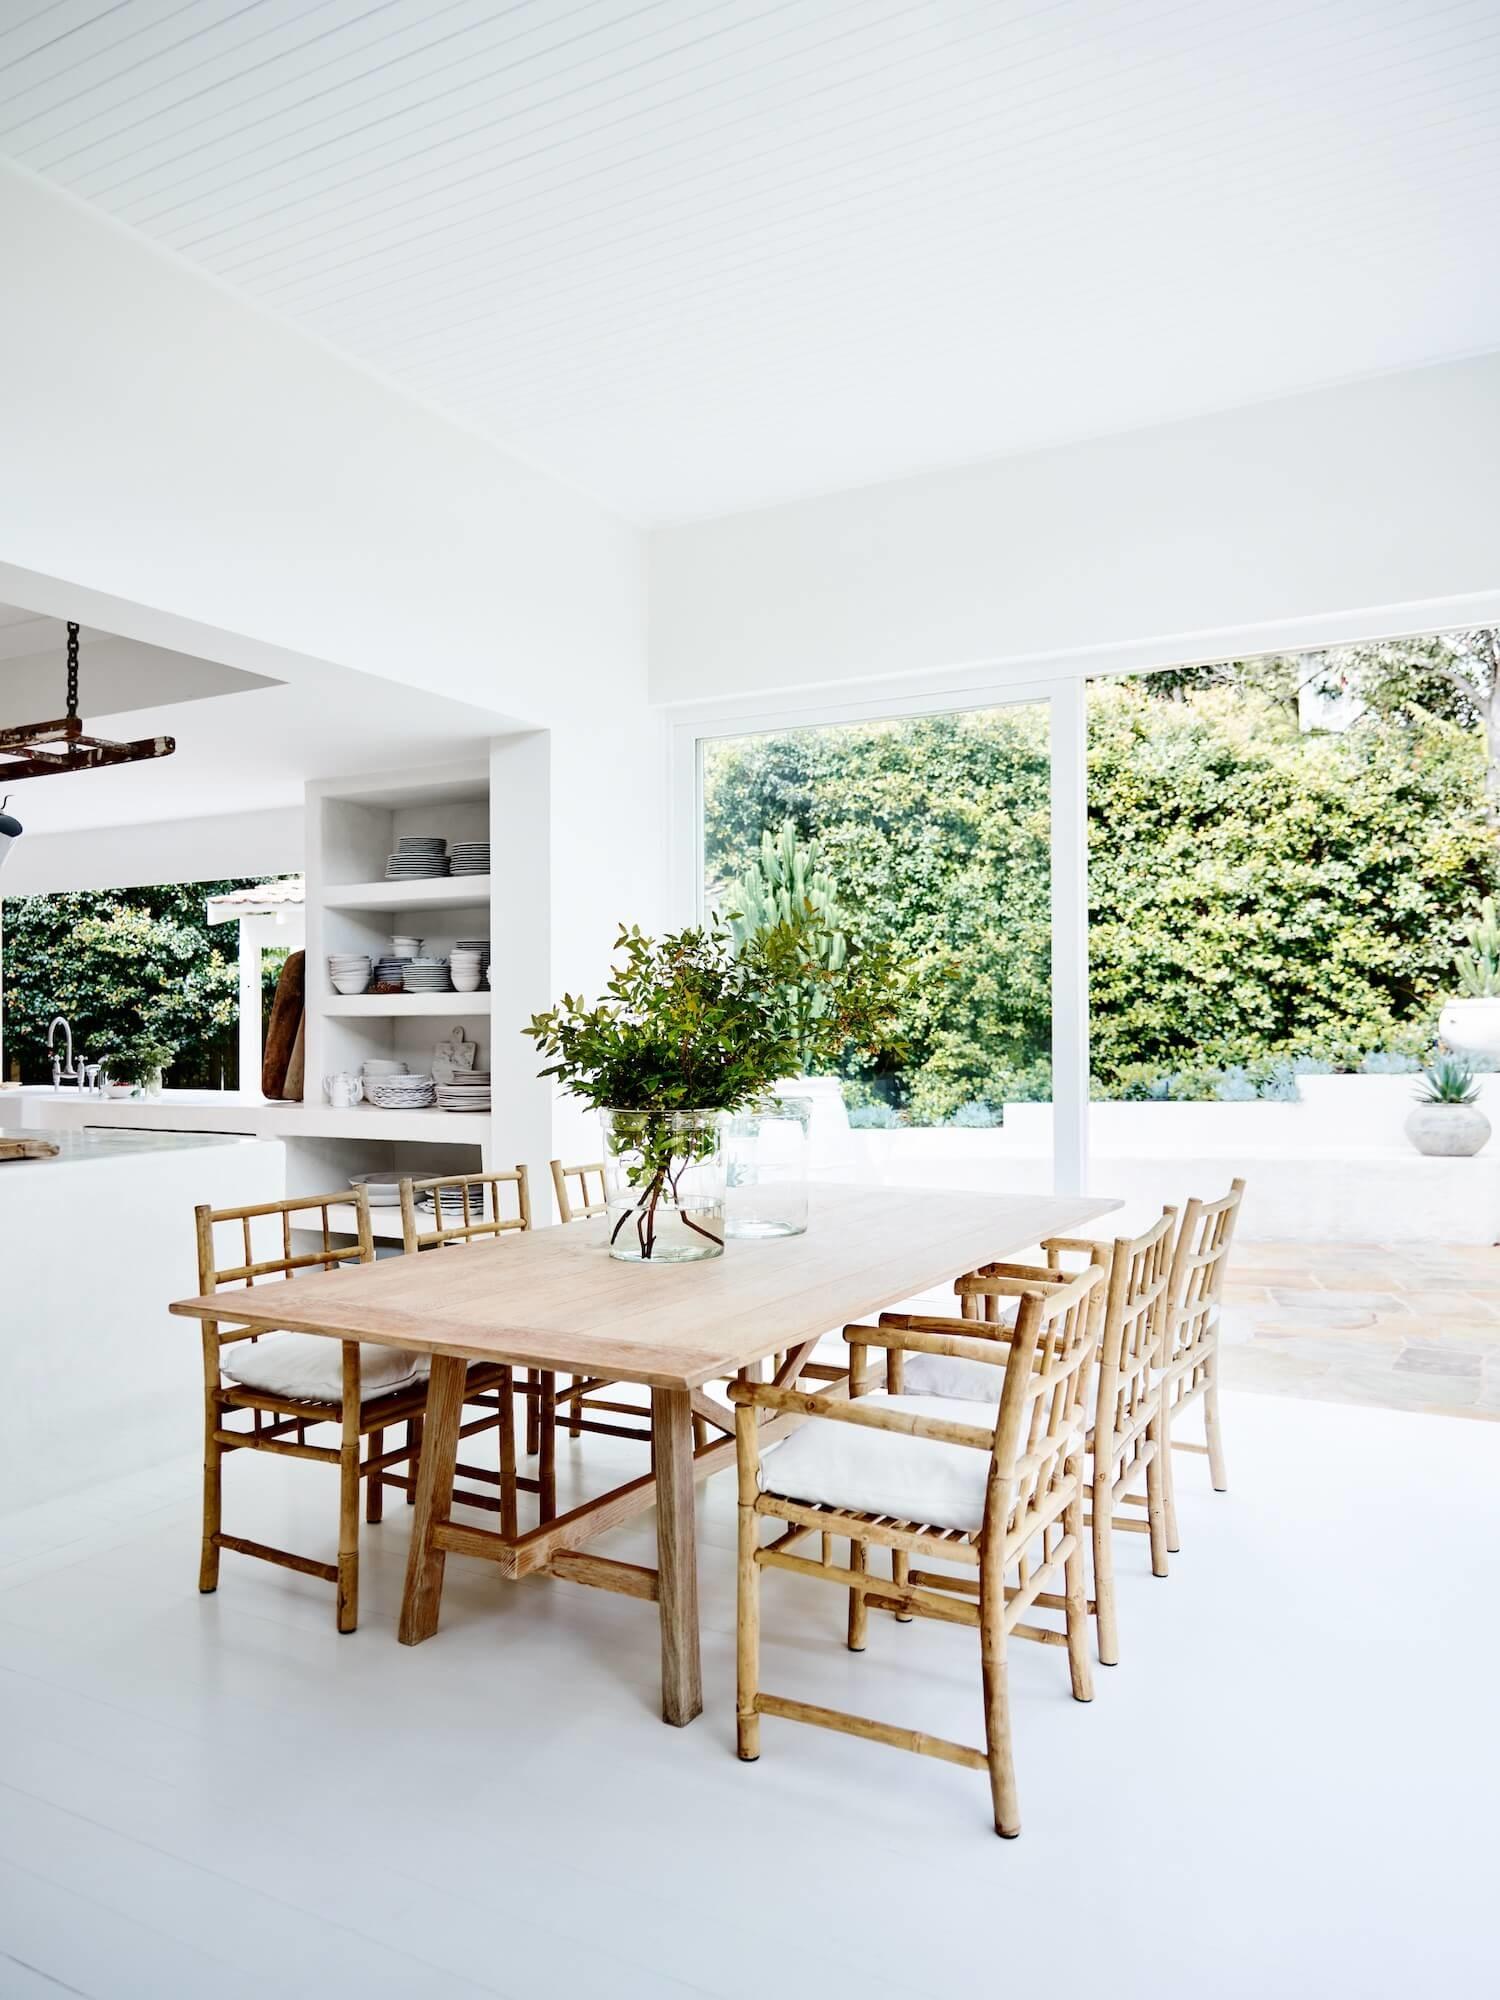 Summer house inspiration! - seen at estliving